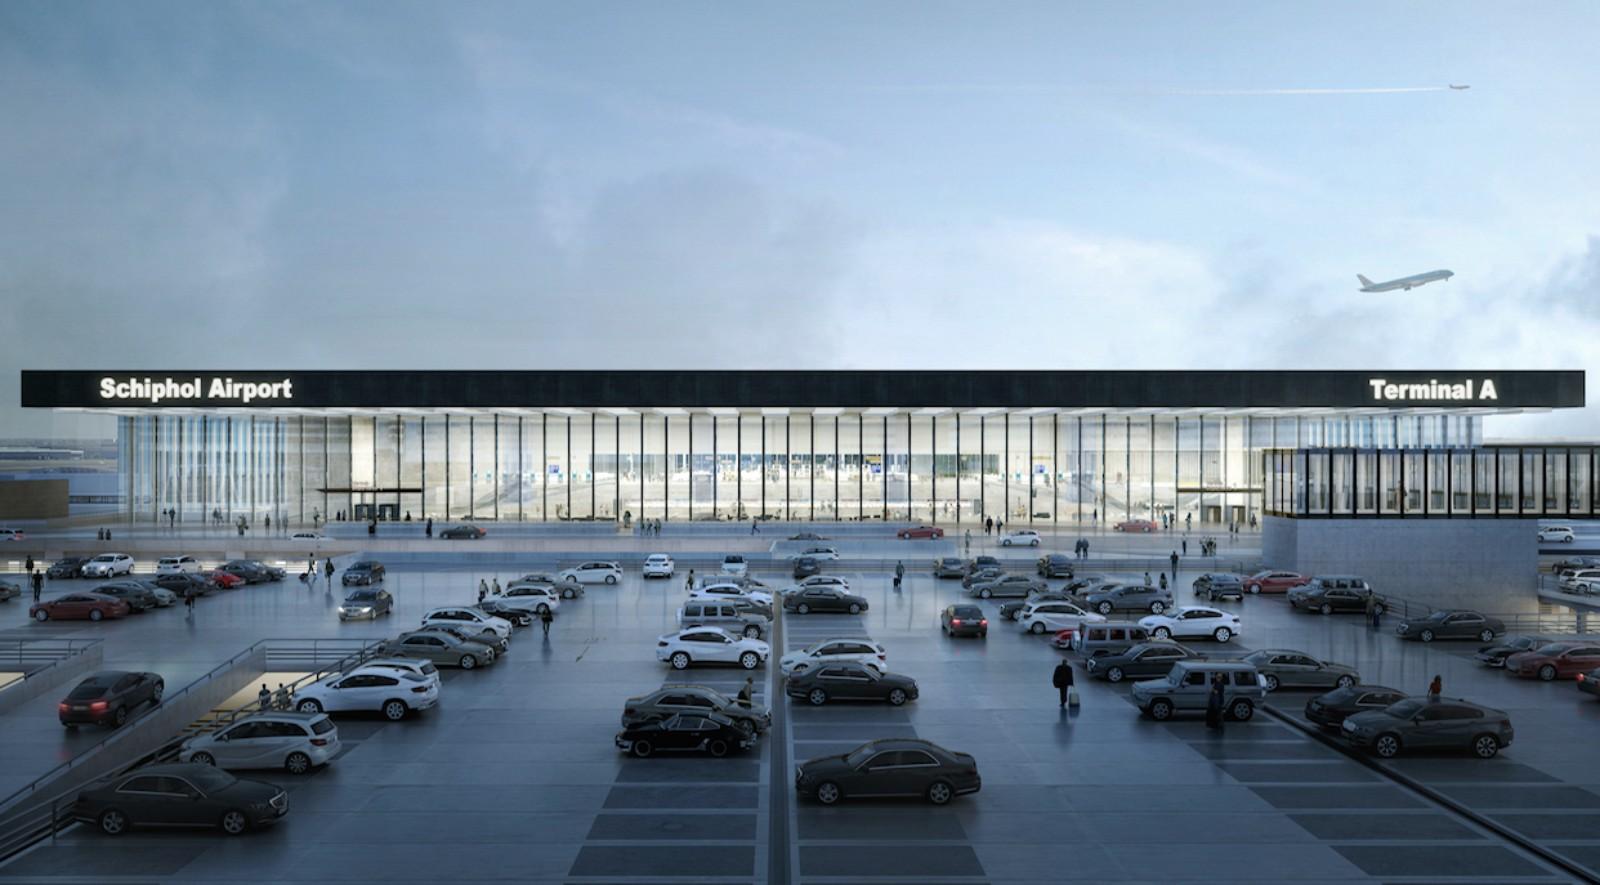 Amsterdam Airport Schiphol Terminal